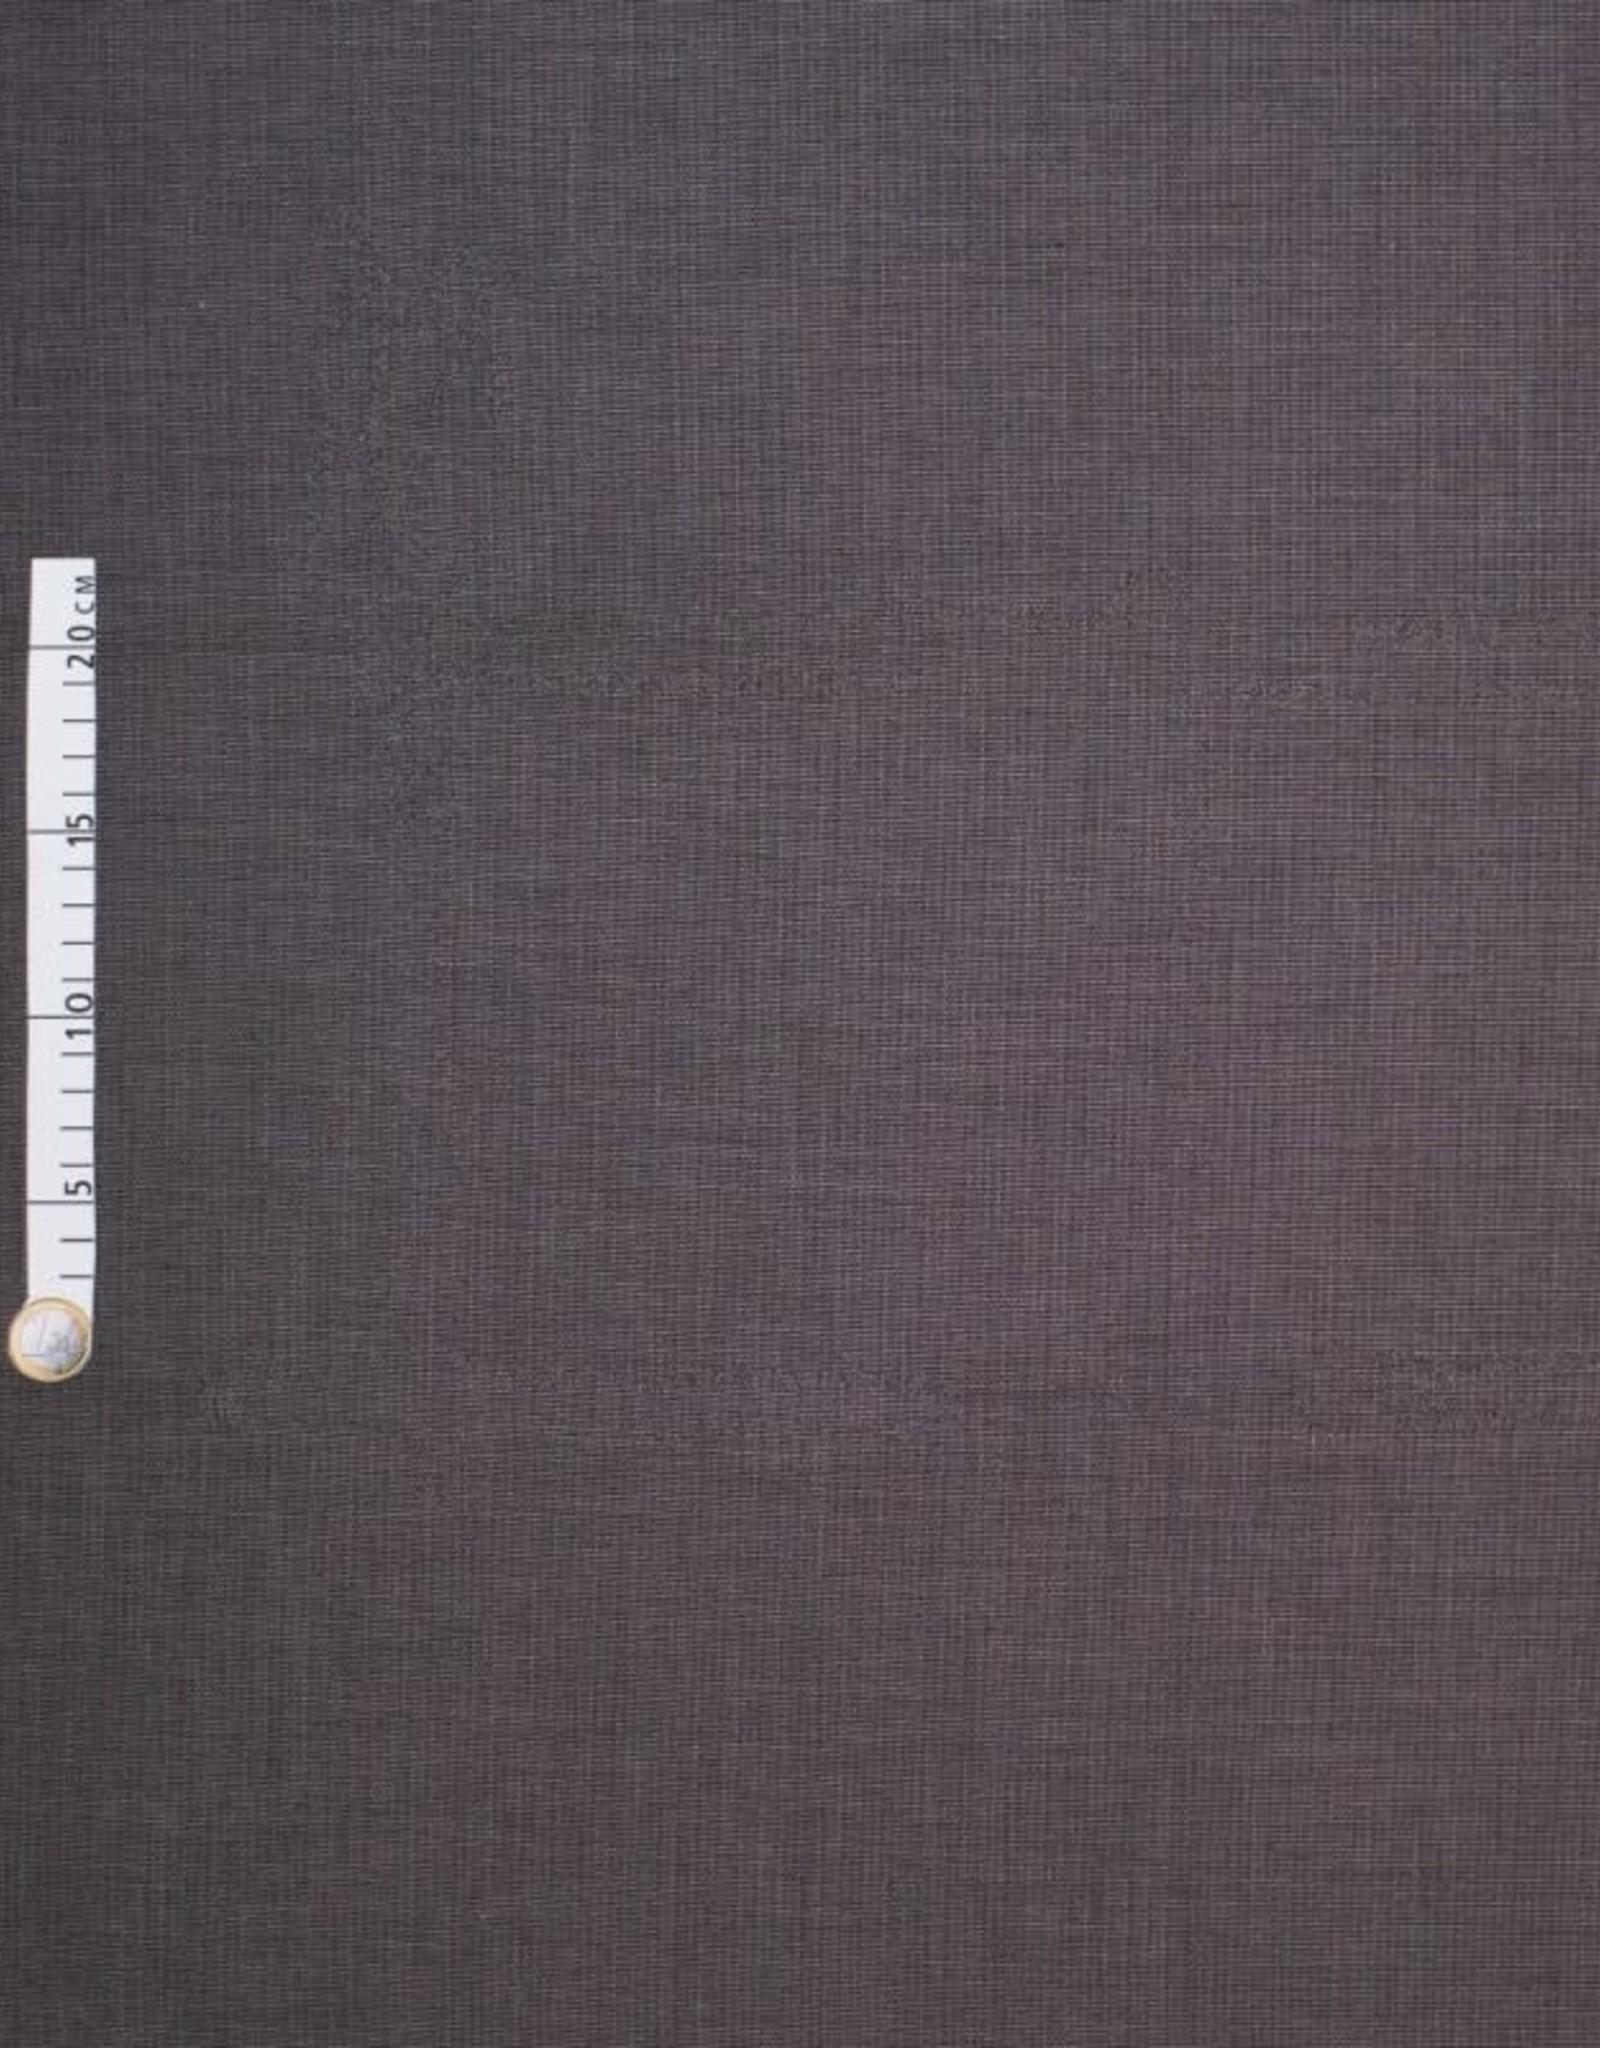 Polytex Polytex geweven bamboo donker grijs recycled